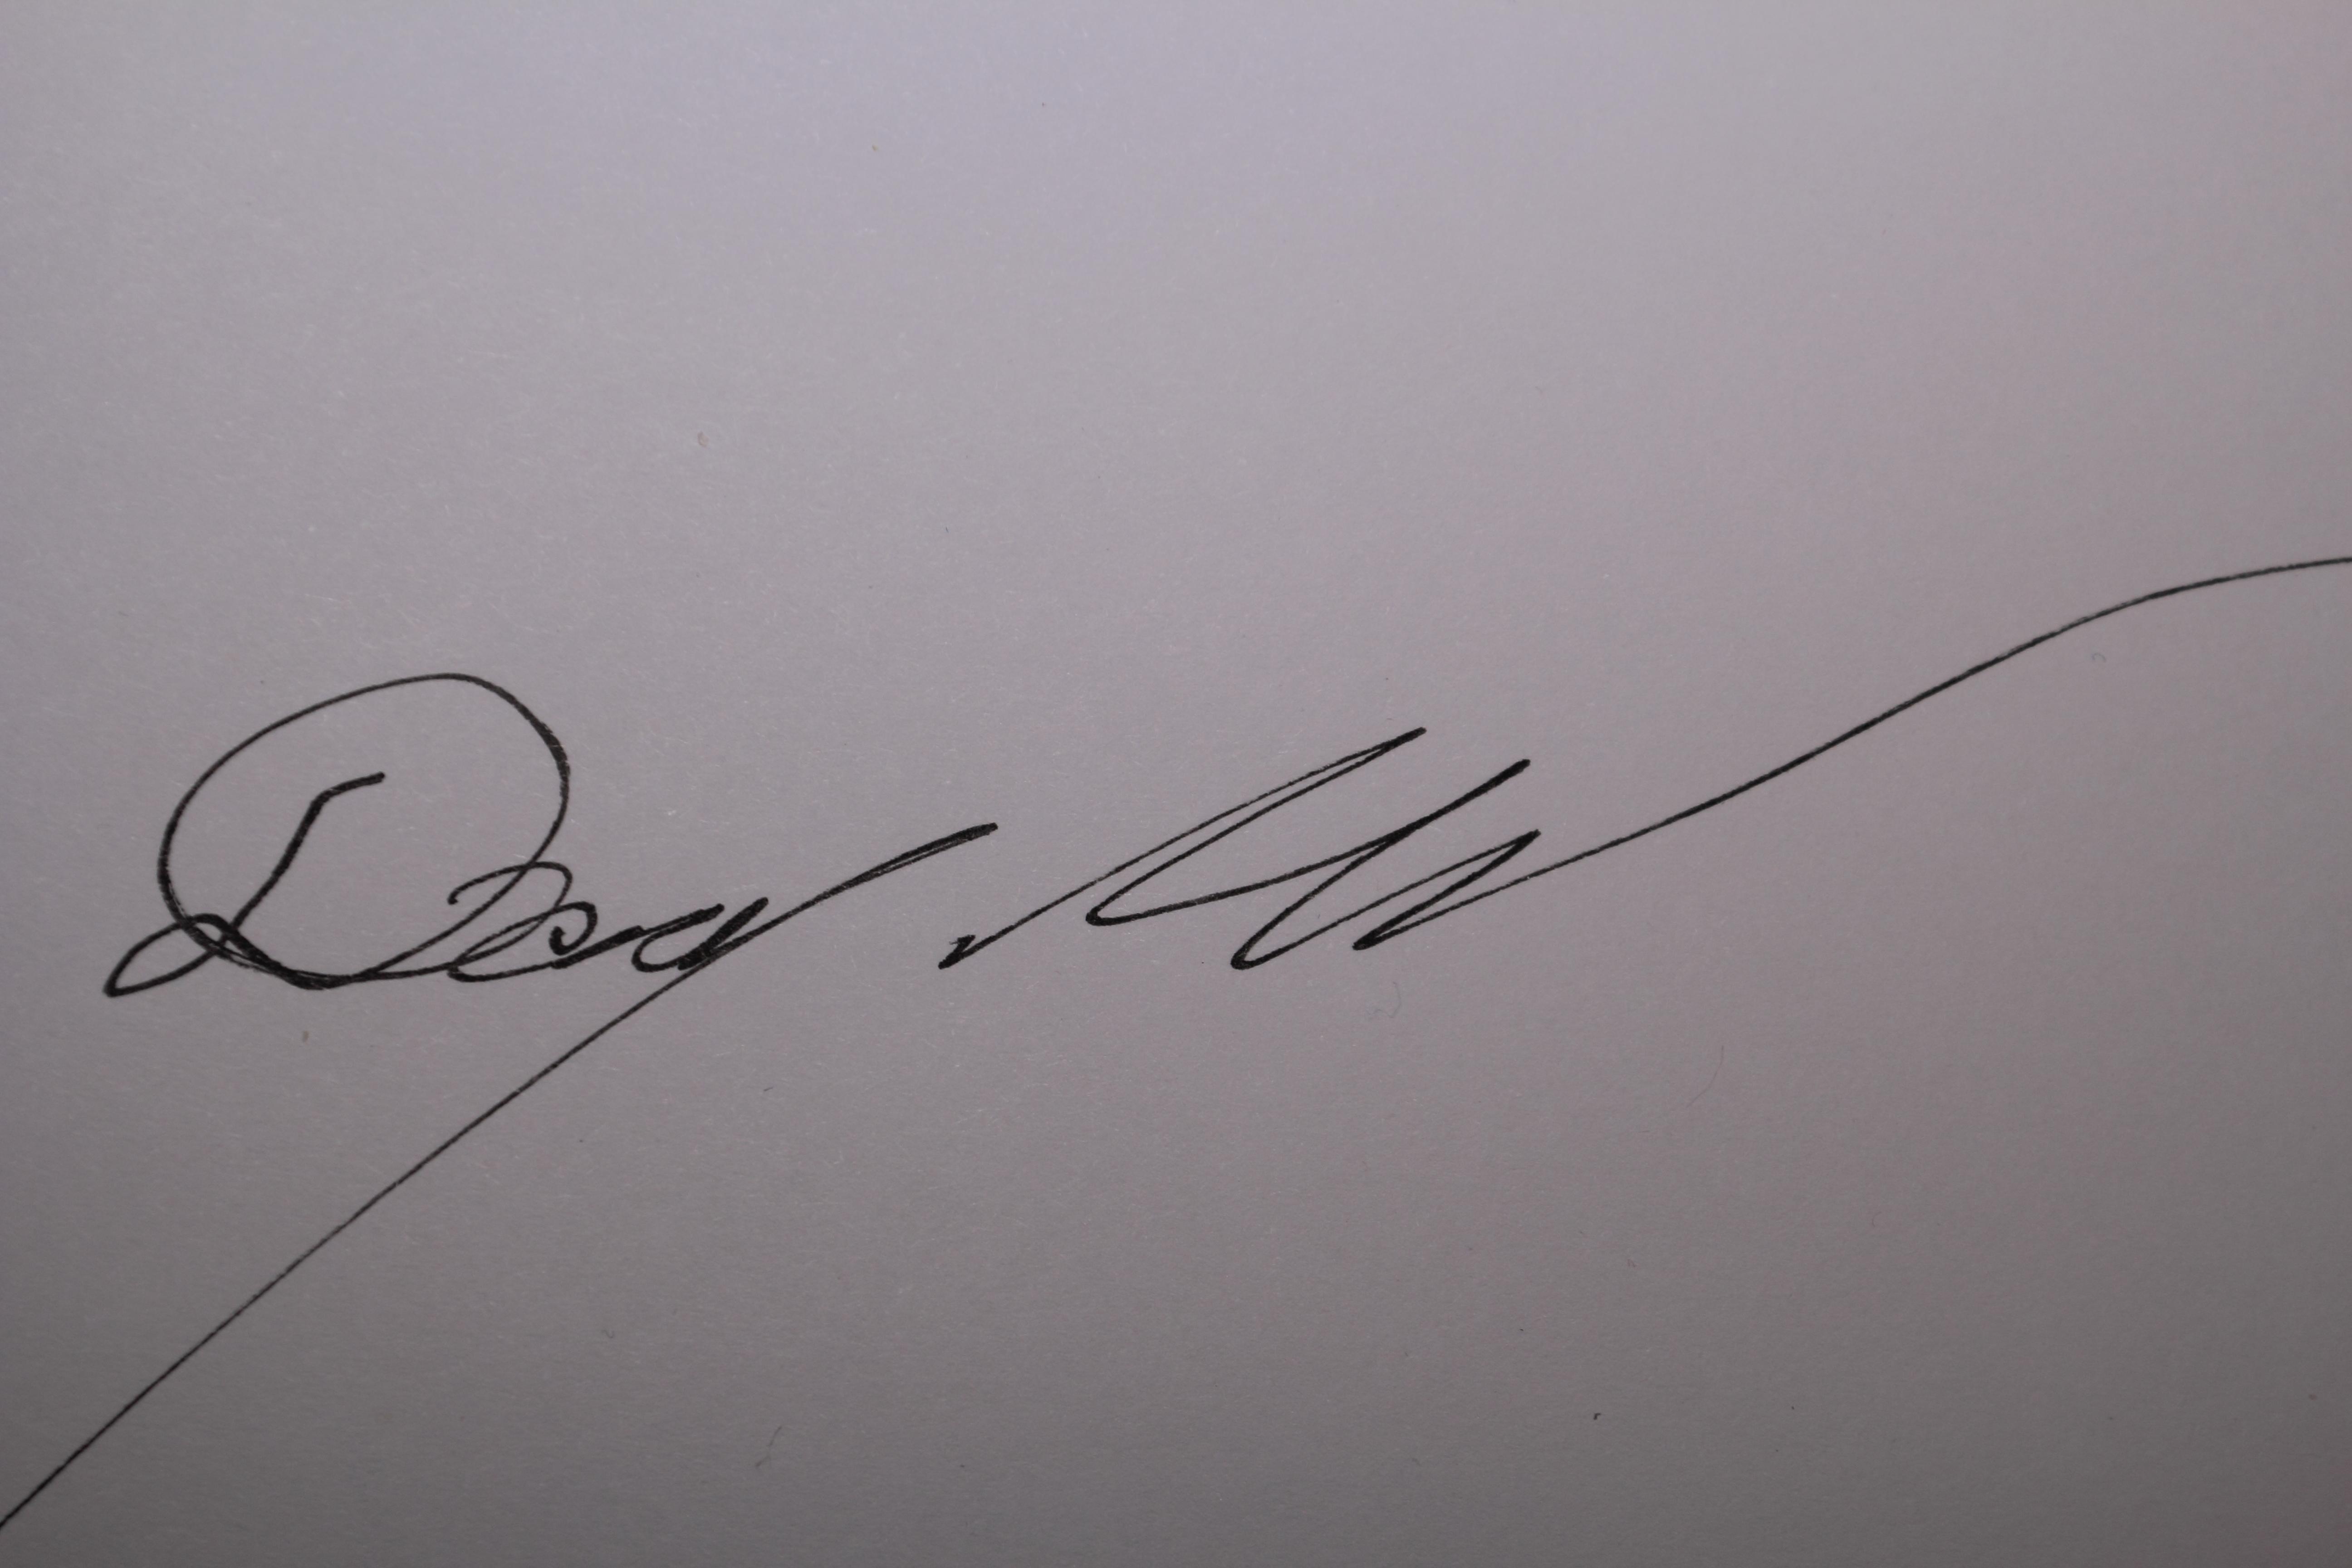 Doug Mills Signature